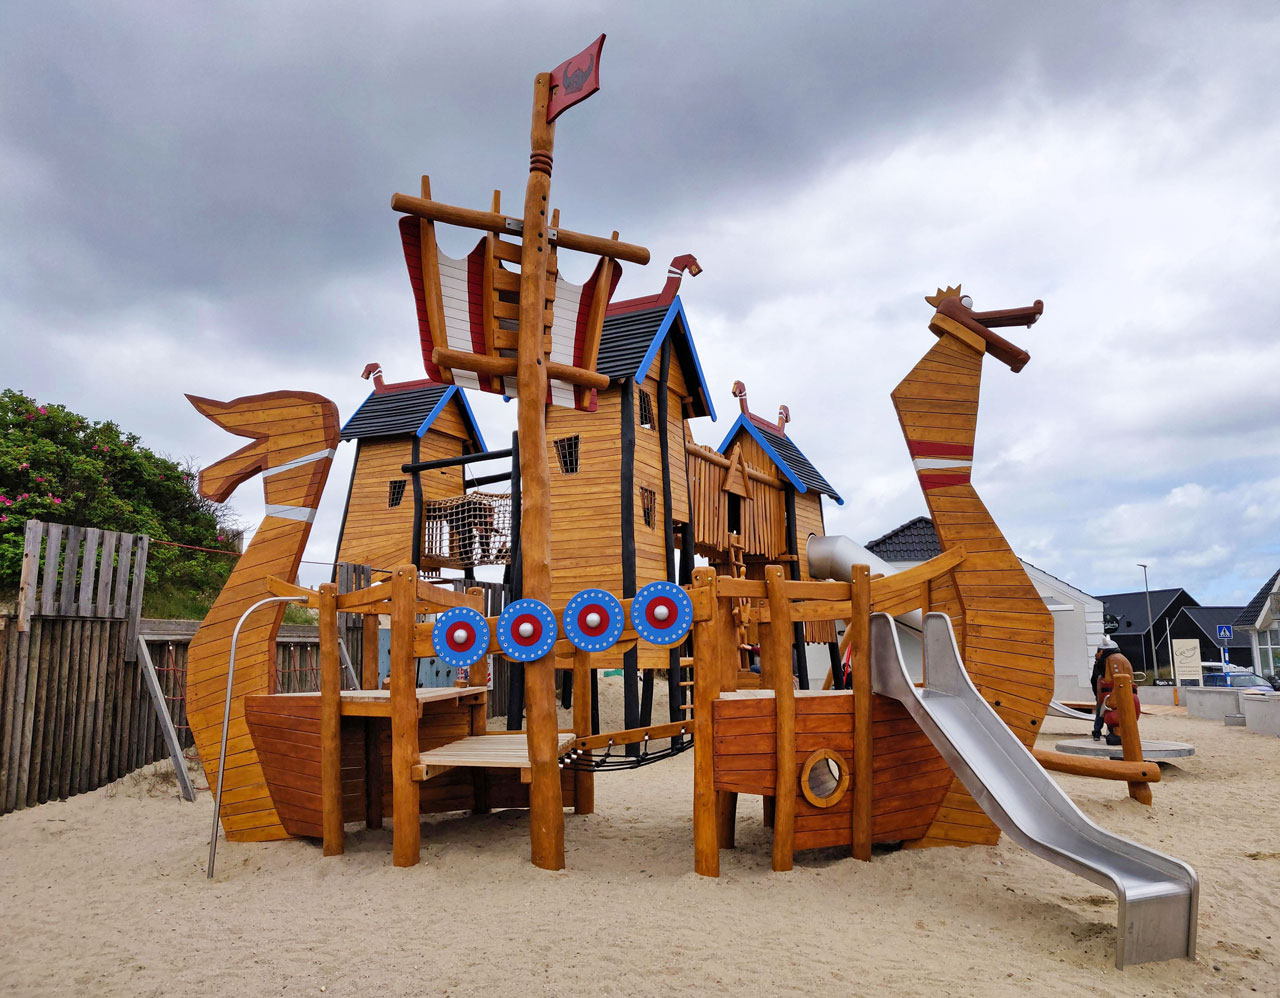 Themenspielplatz, Hyggelige Dänen, Vejers Strand, Dänemark